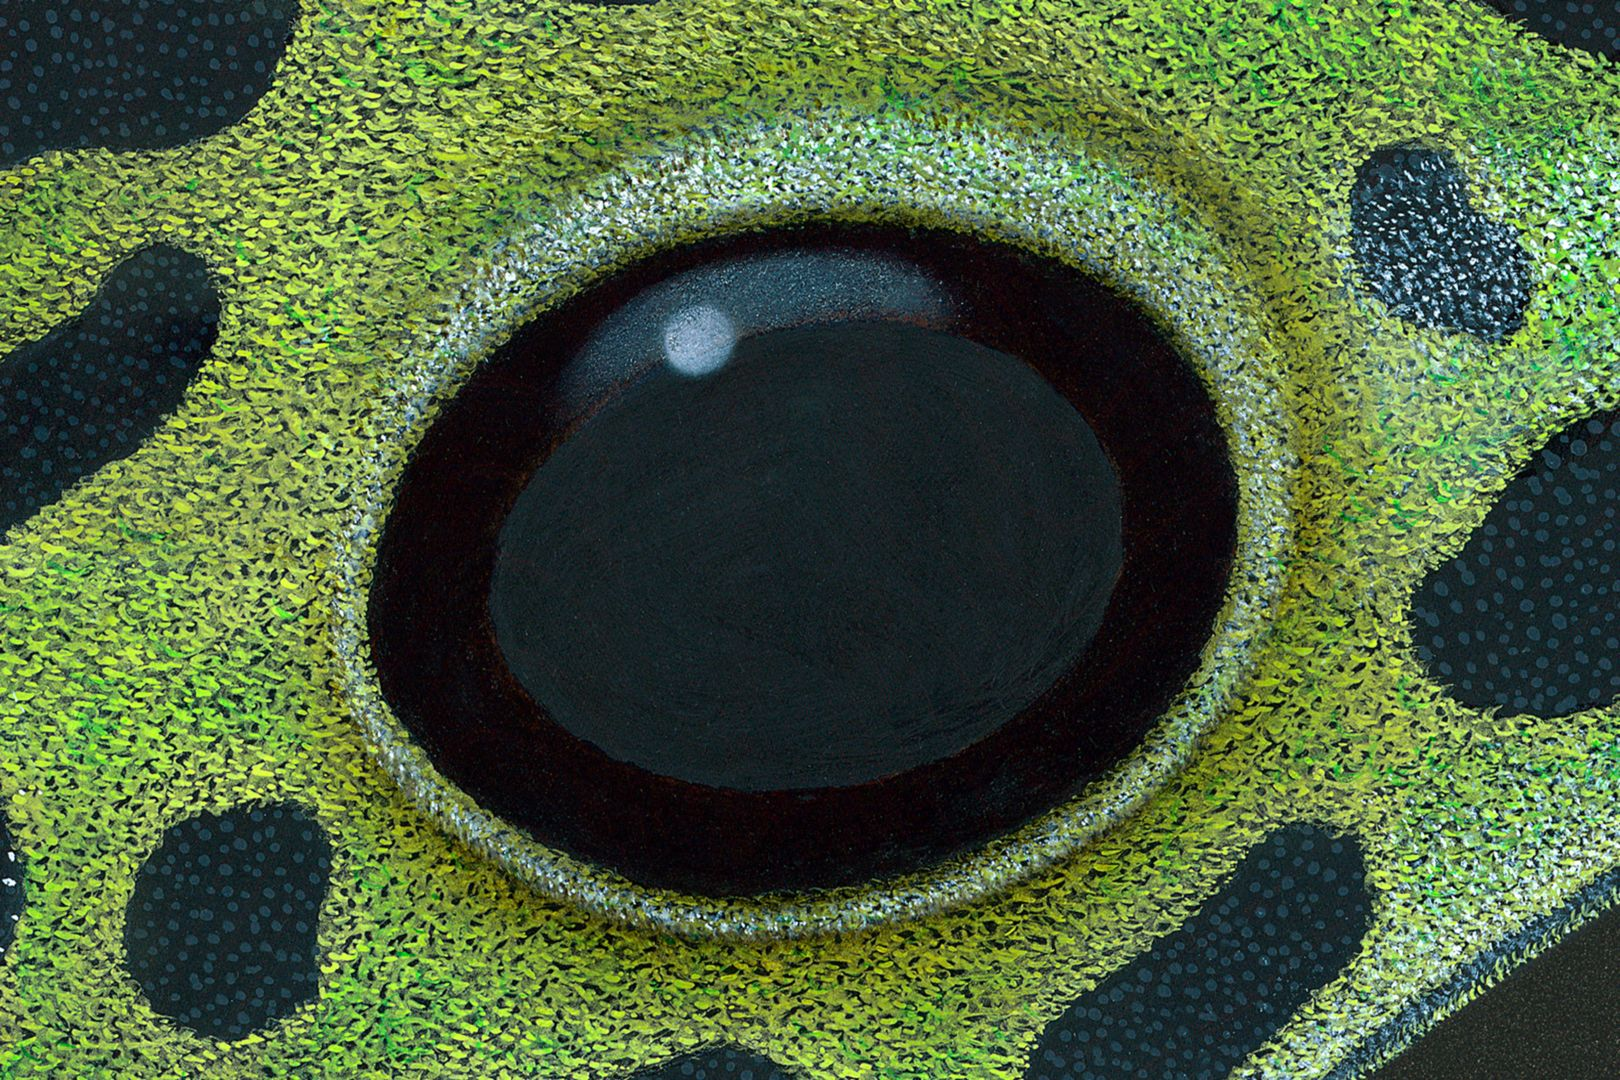 Pfeilgiftfrosch Auge